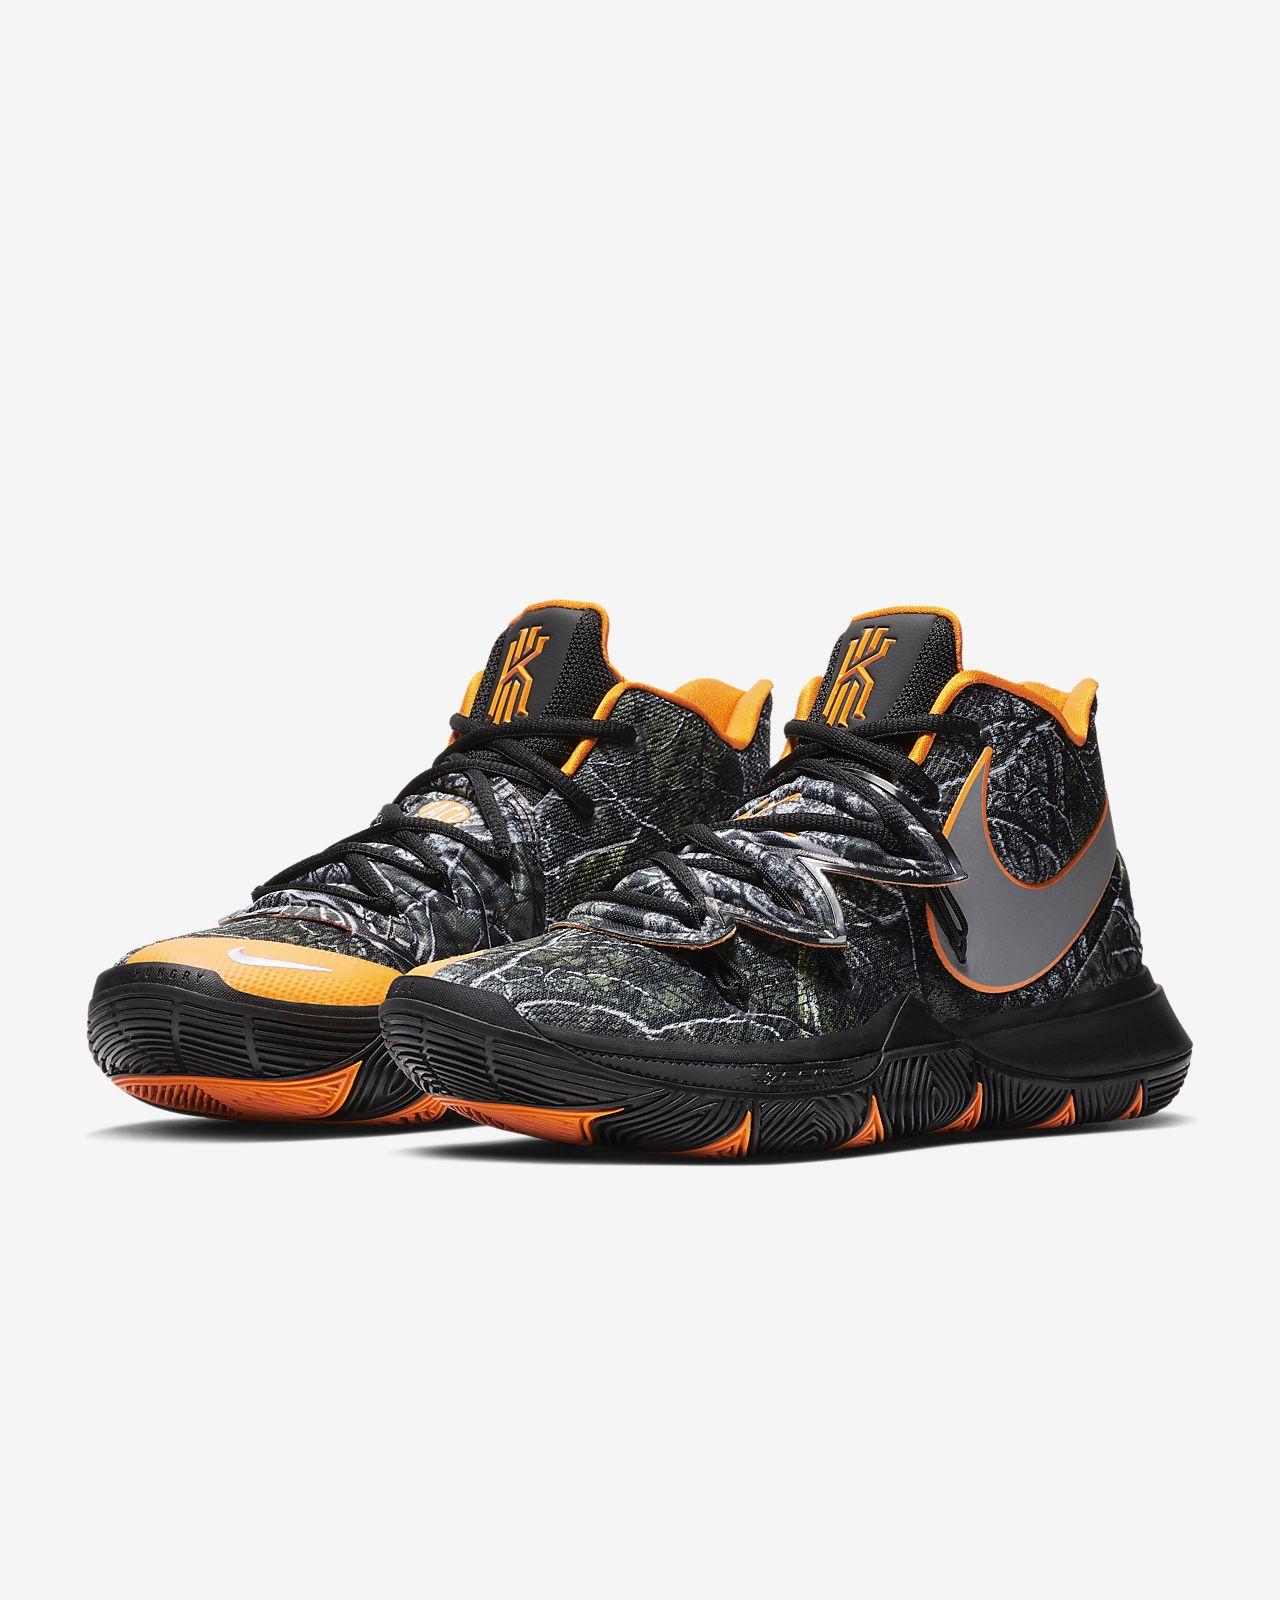 404c1ae3eca9 Low Resolution Kyrie 5 Basketball Shoe Kyrie 5 Basketball Shoe